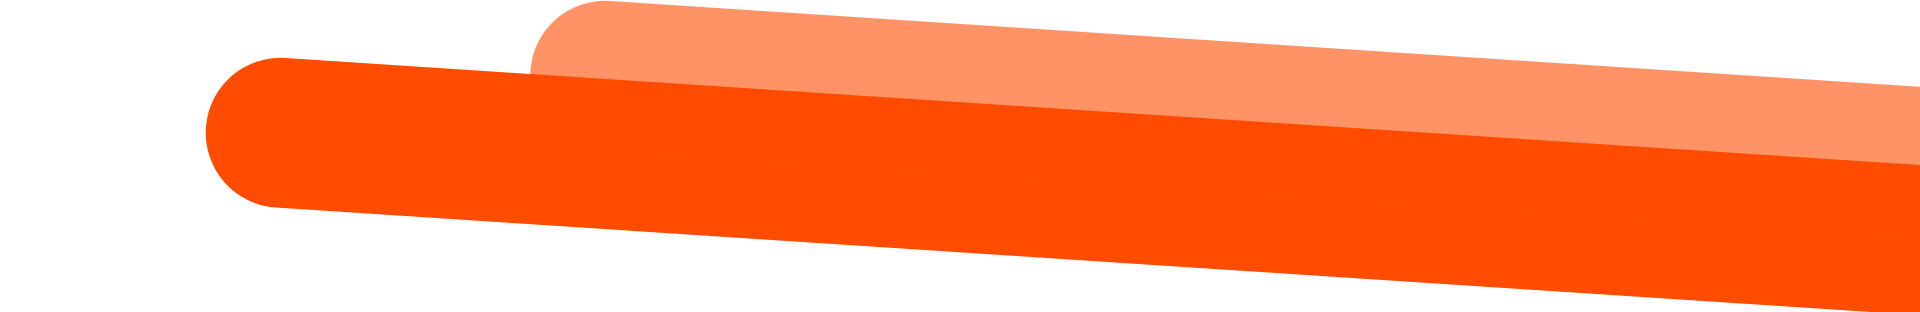 strip_orange_1920